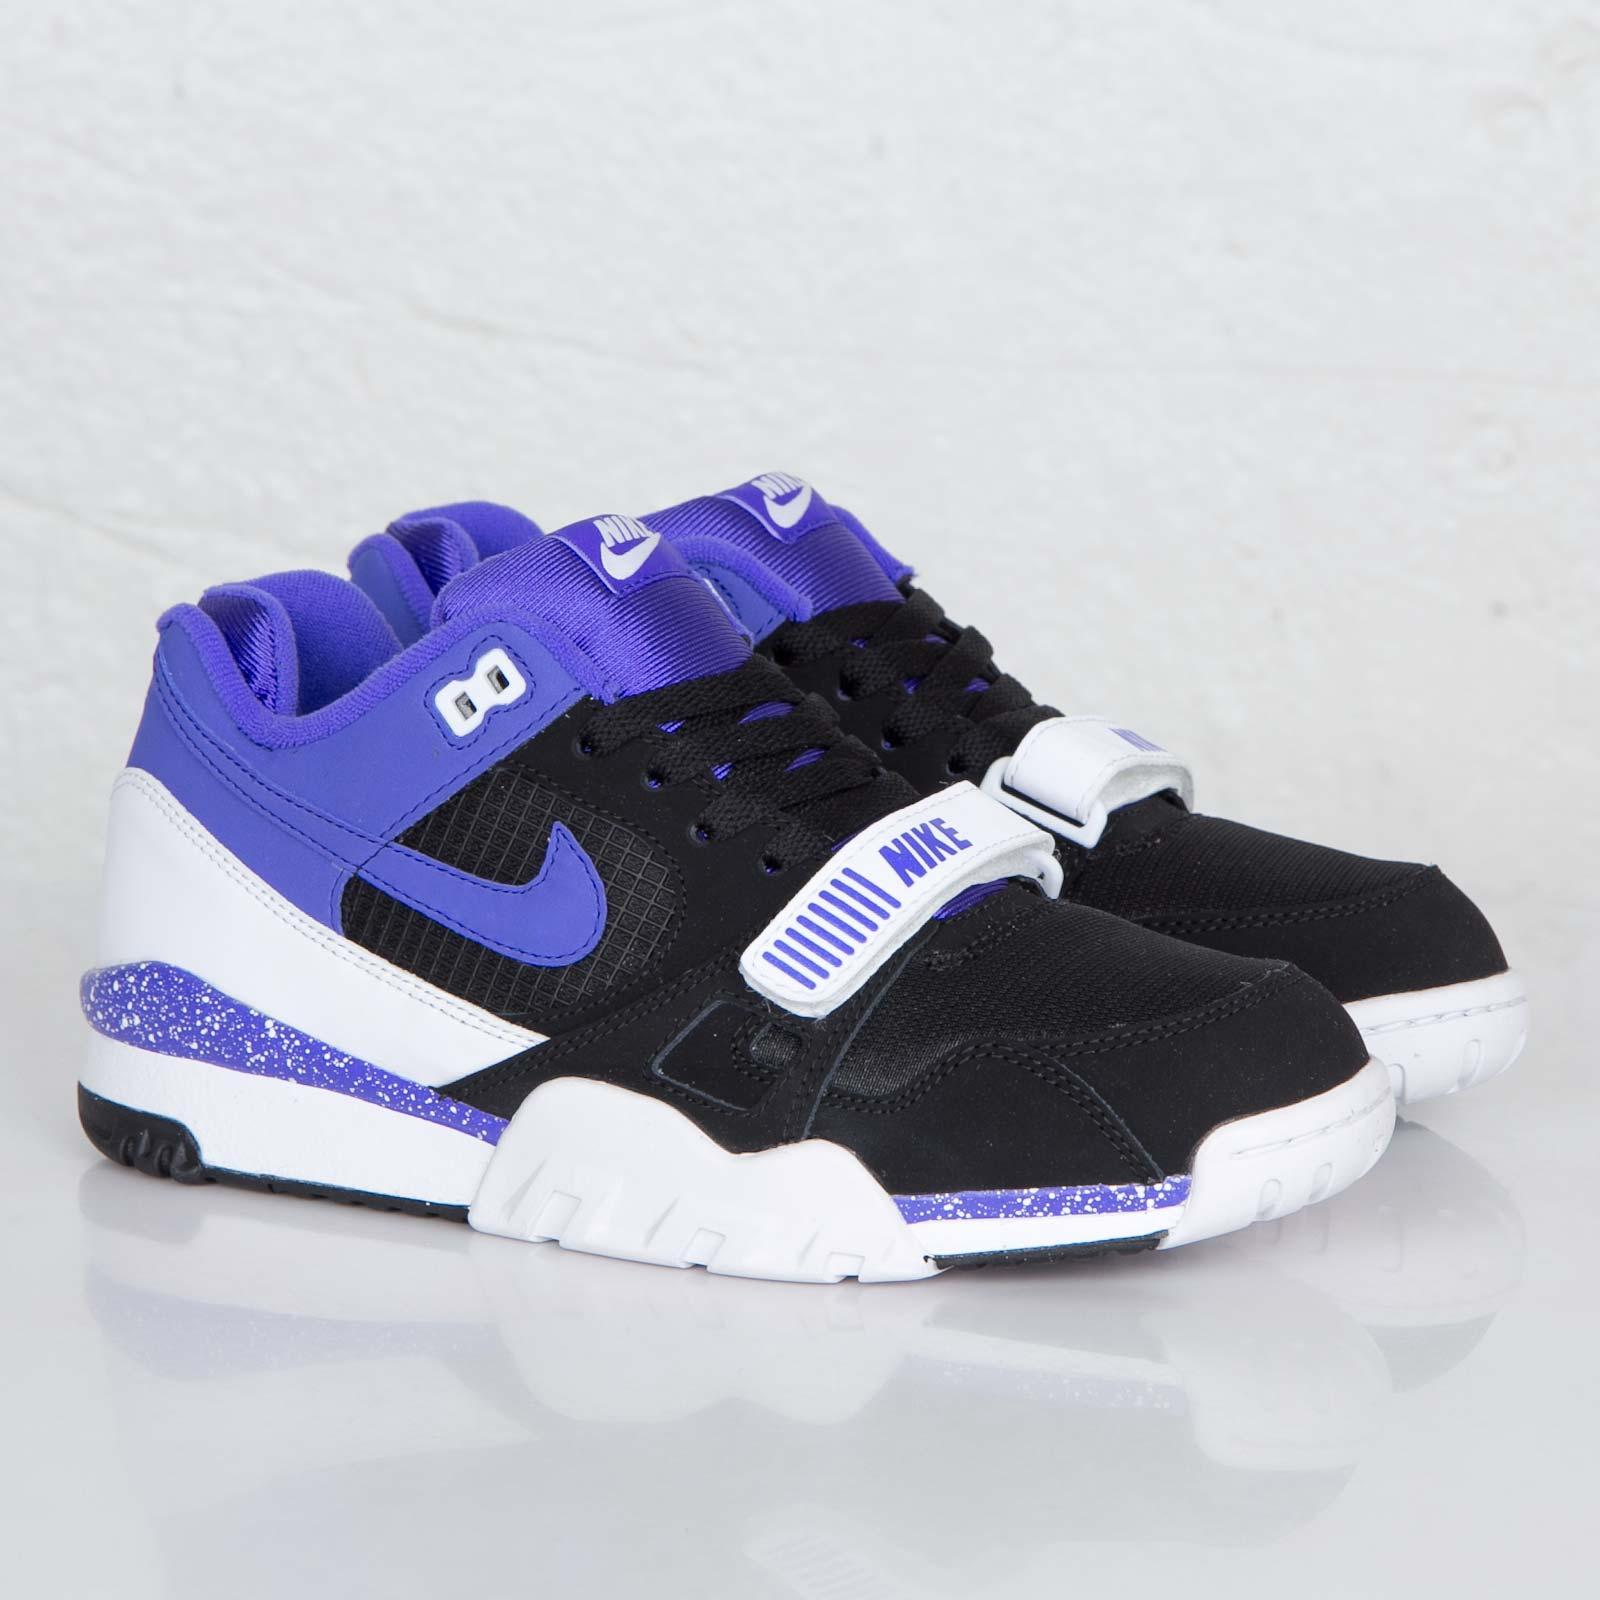 e0e33f0dcfc5 Nike Air Trainer 2 Premium QS - 632193-001 - Sneakersnstuff ...